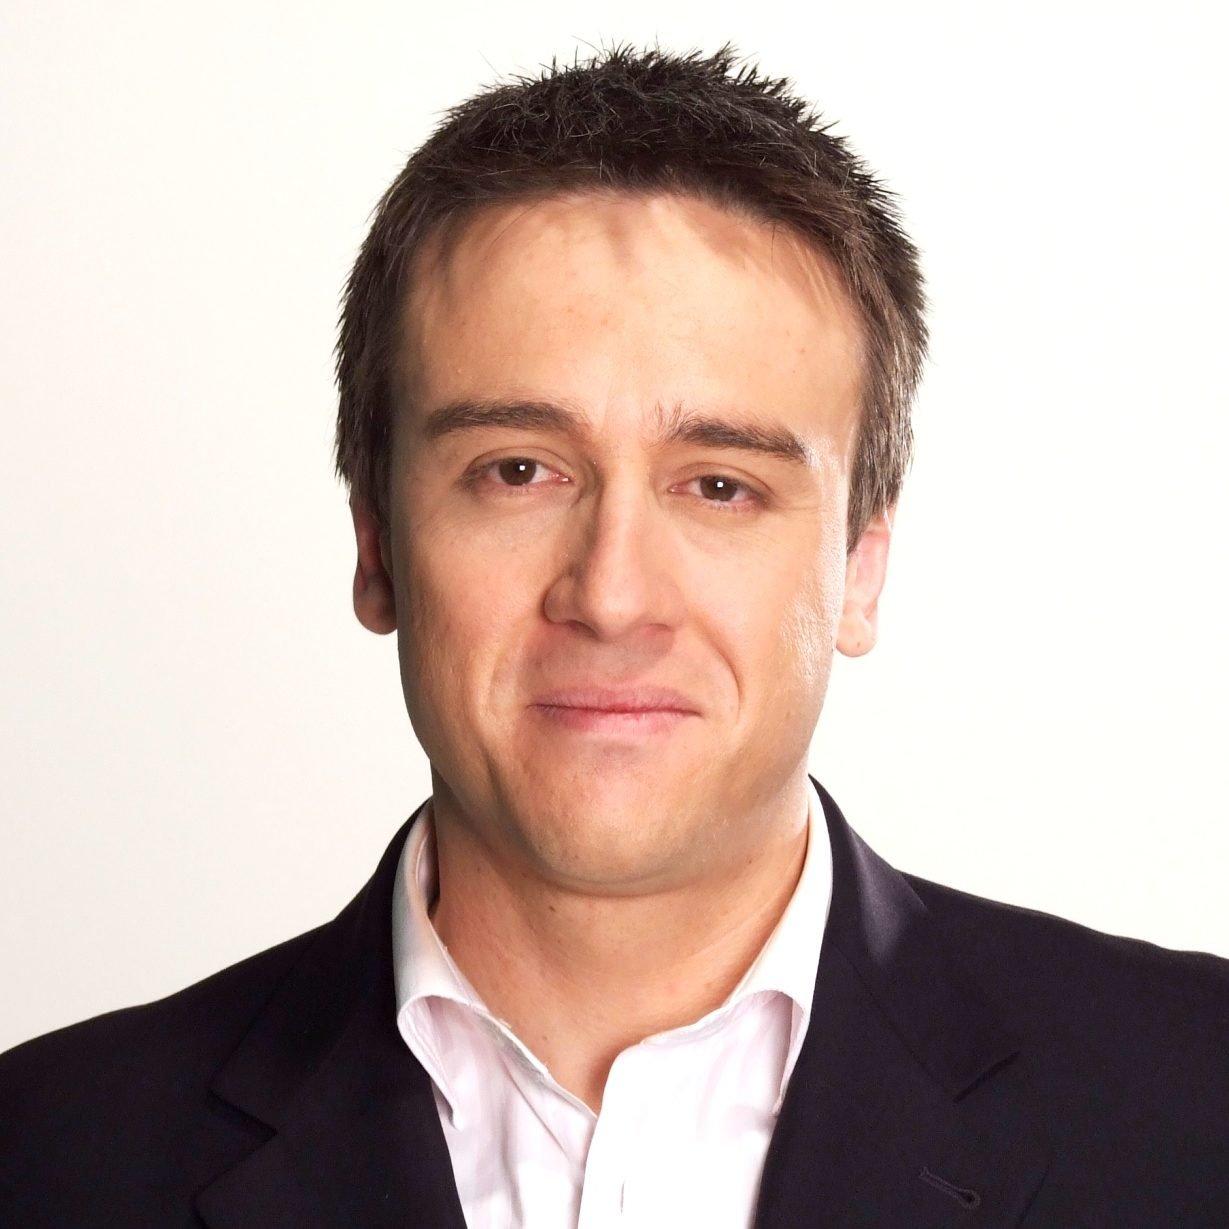 Tony Nicholls